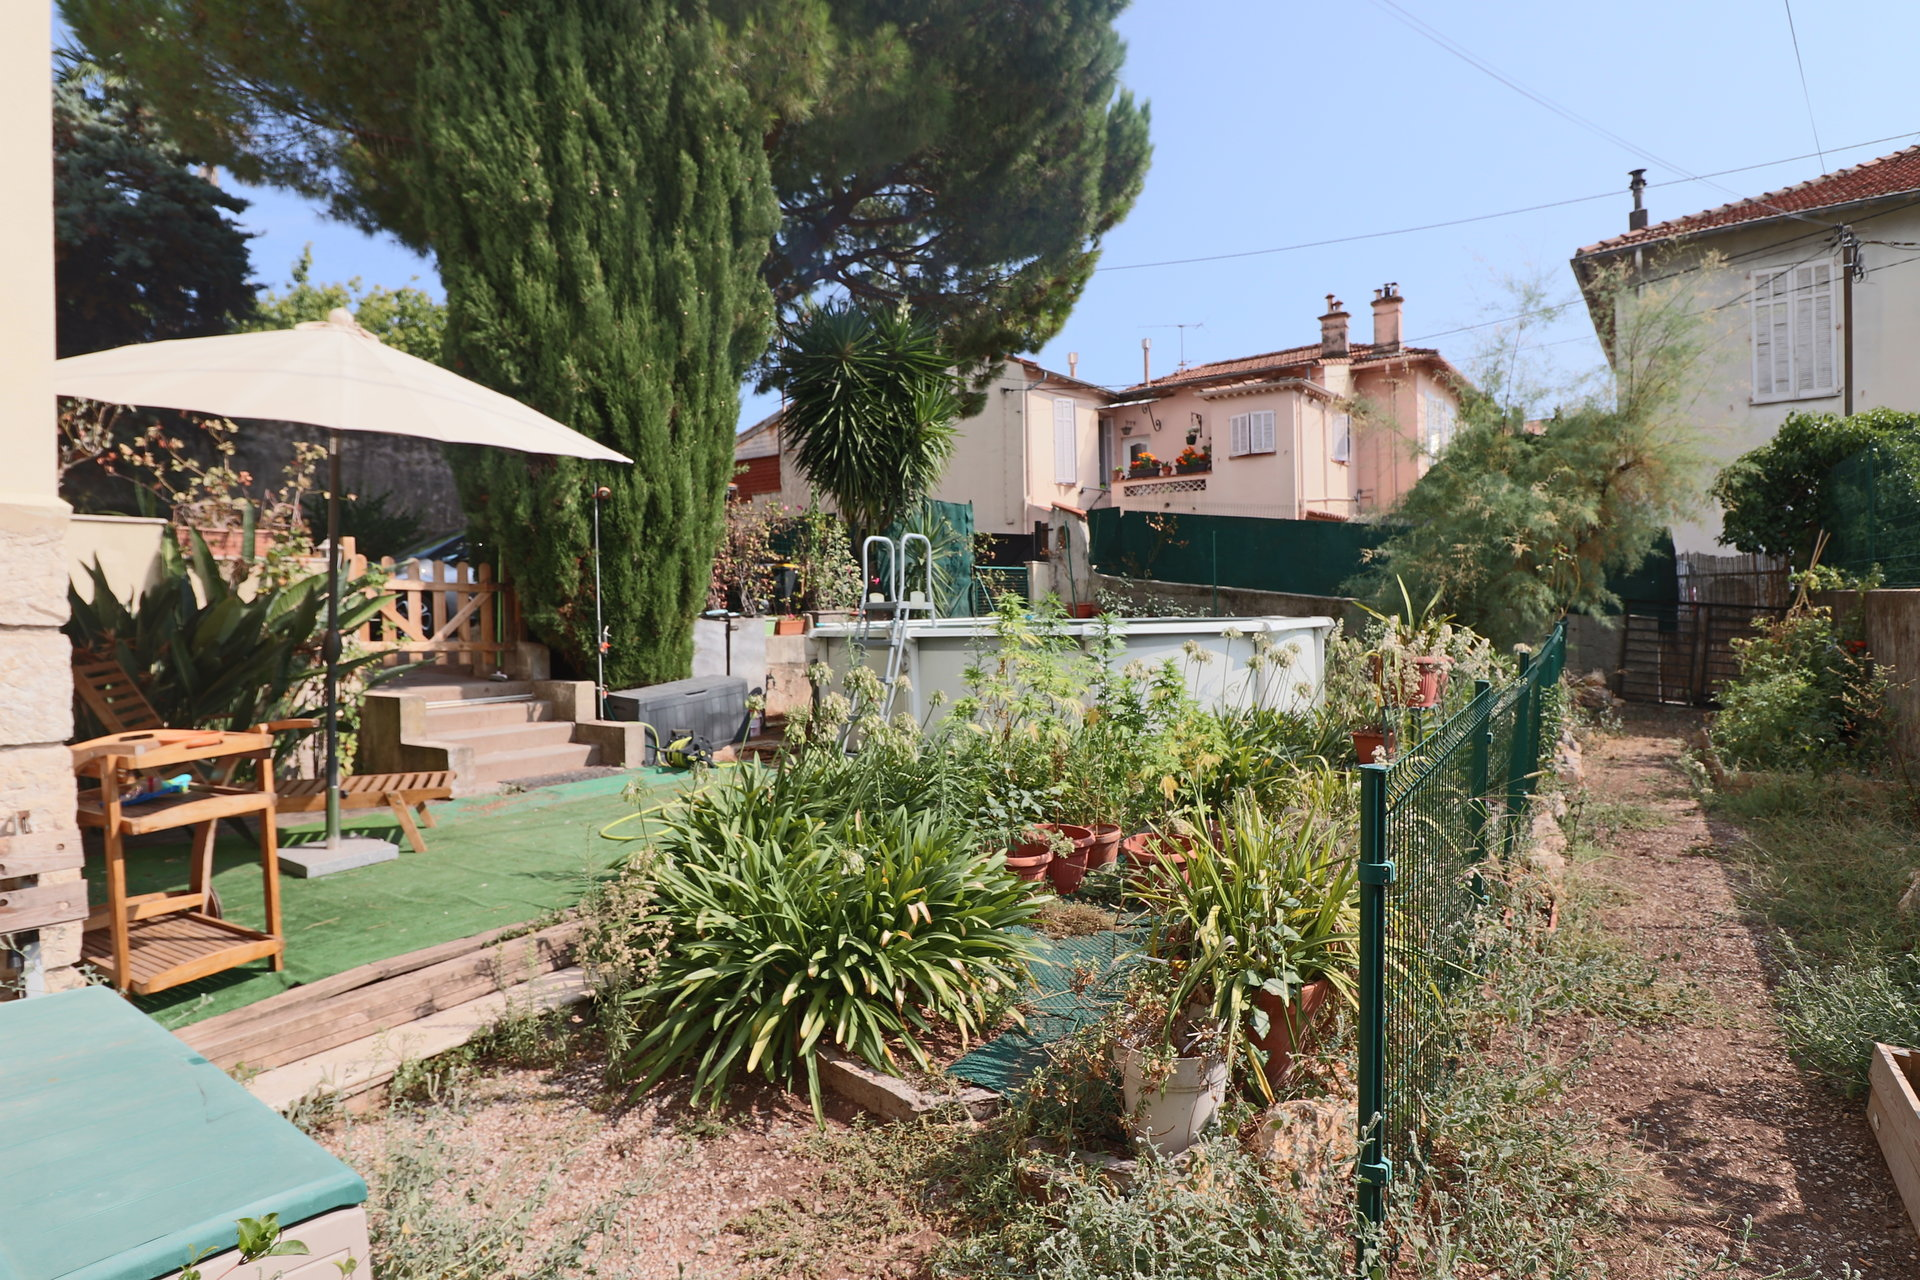 Vendita Casa - Le Cannet Rocheville